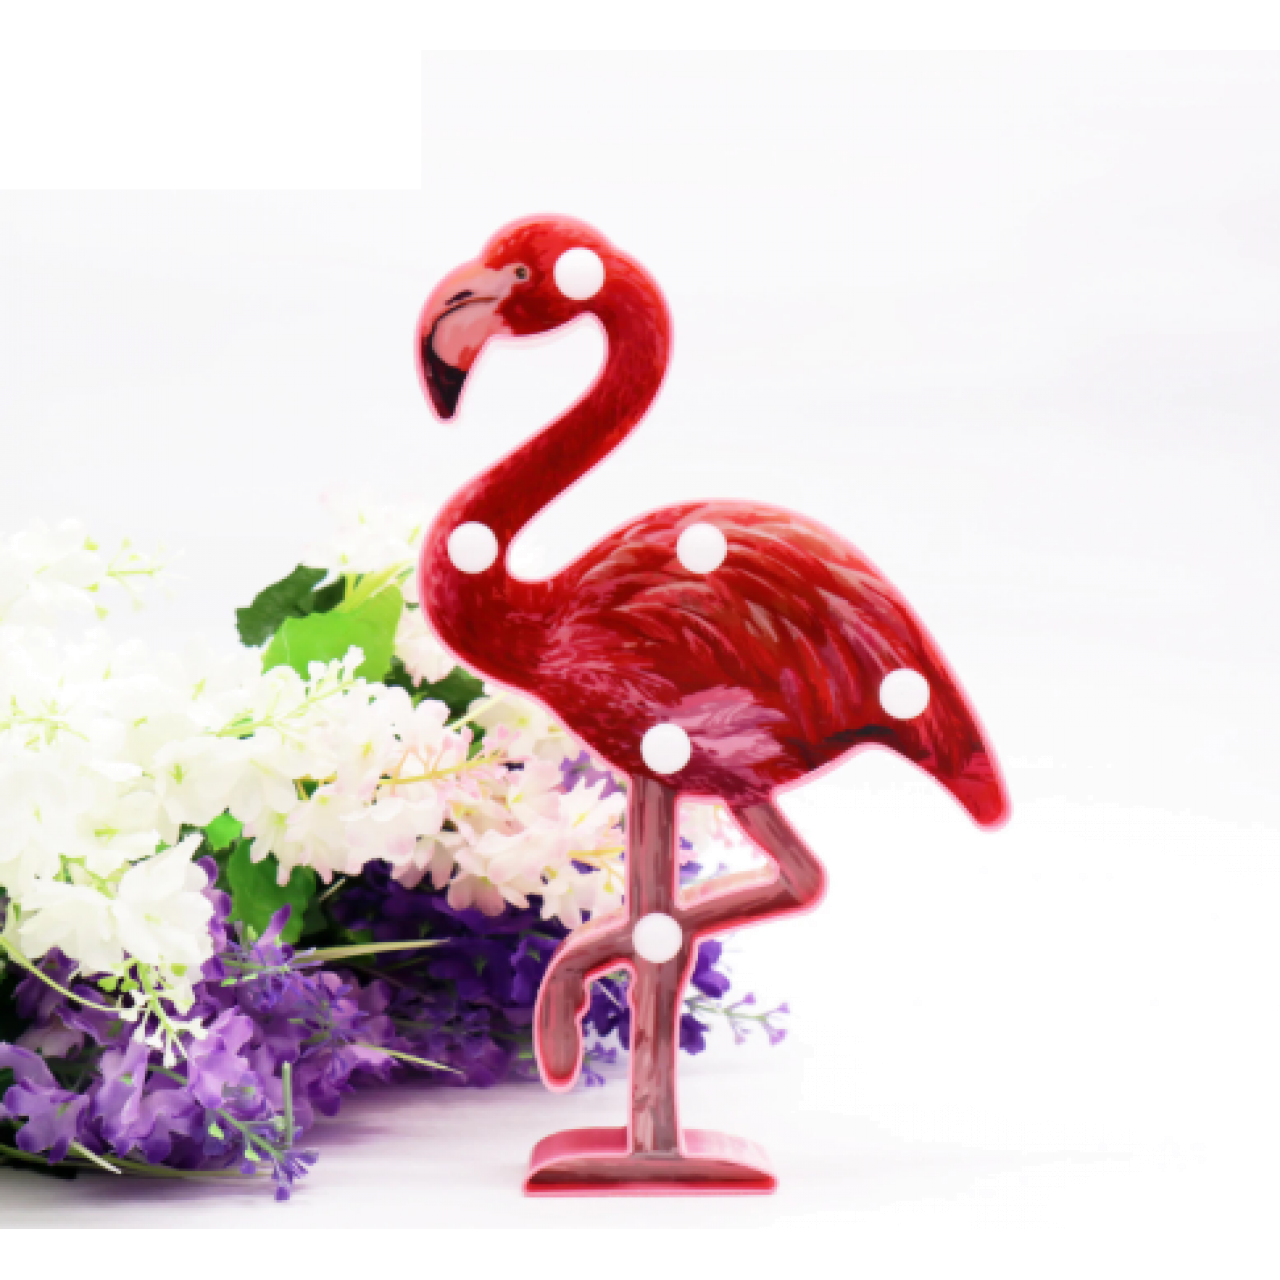 Led светильник фламинго малиновый